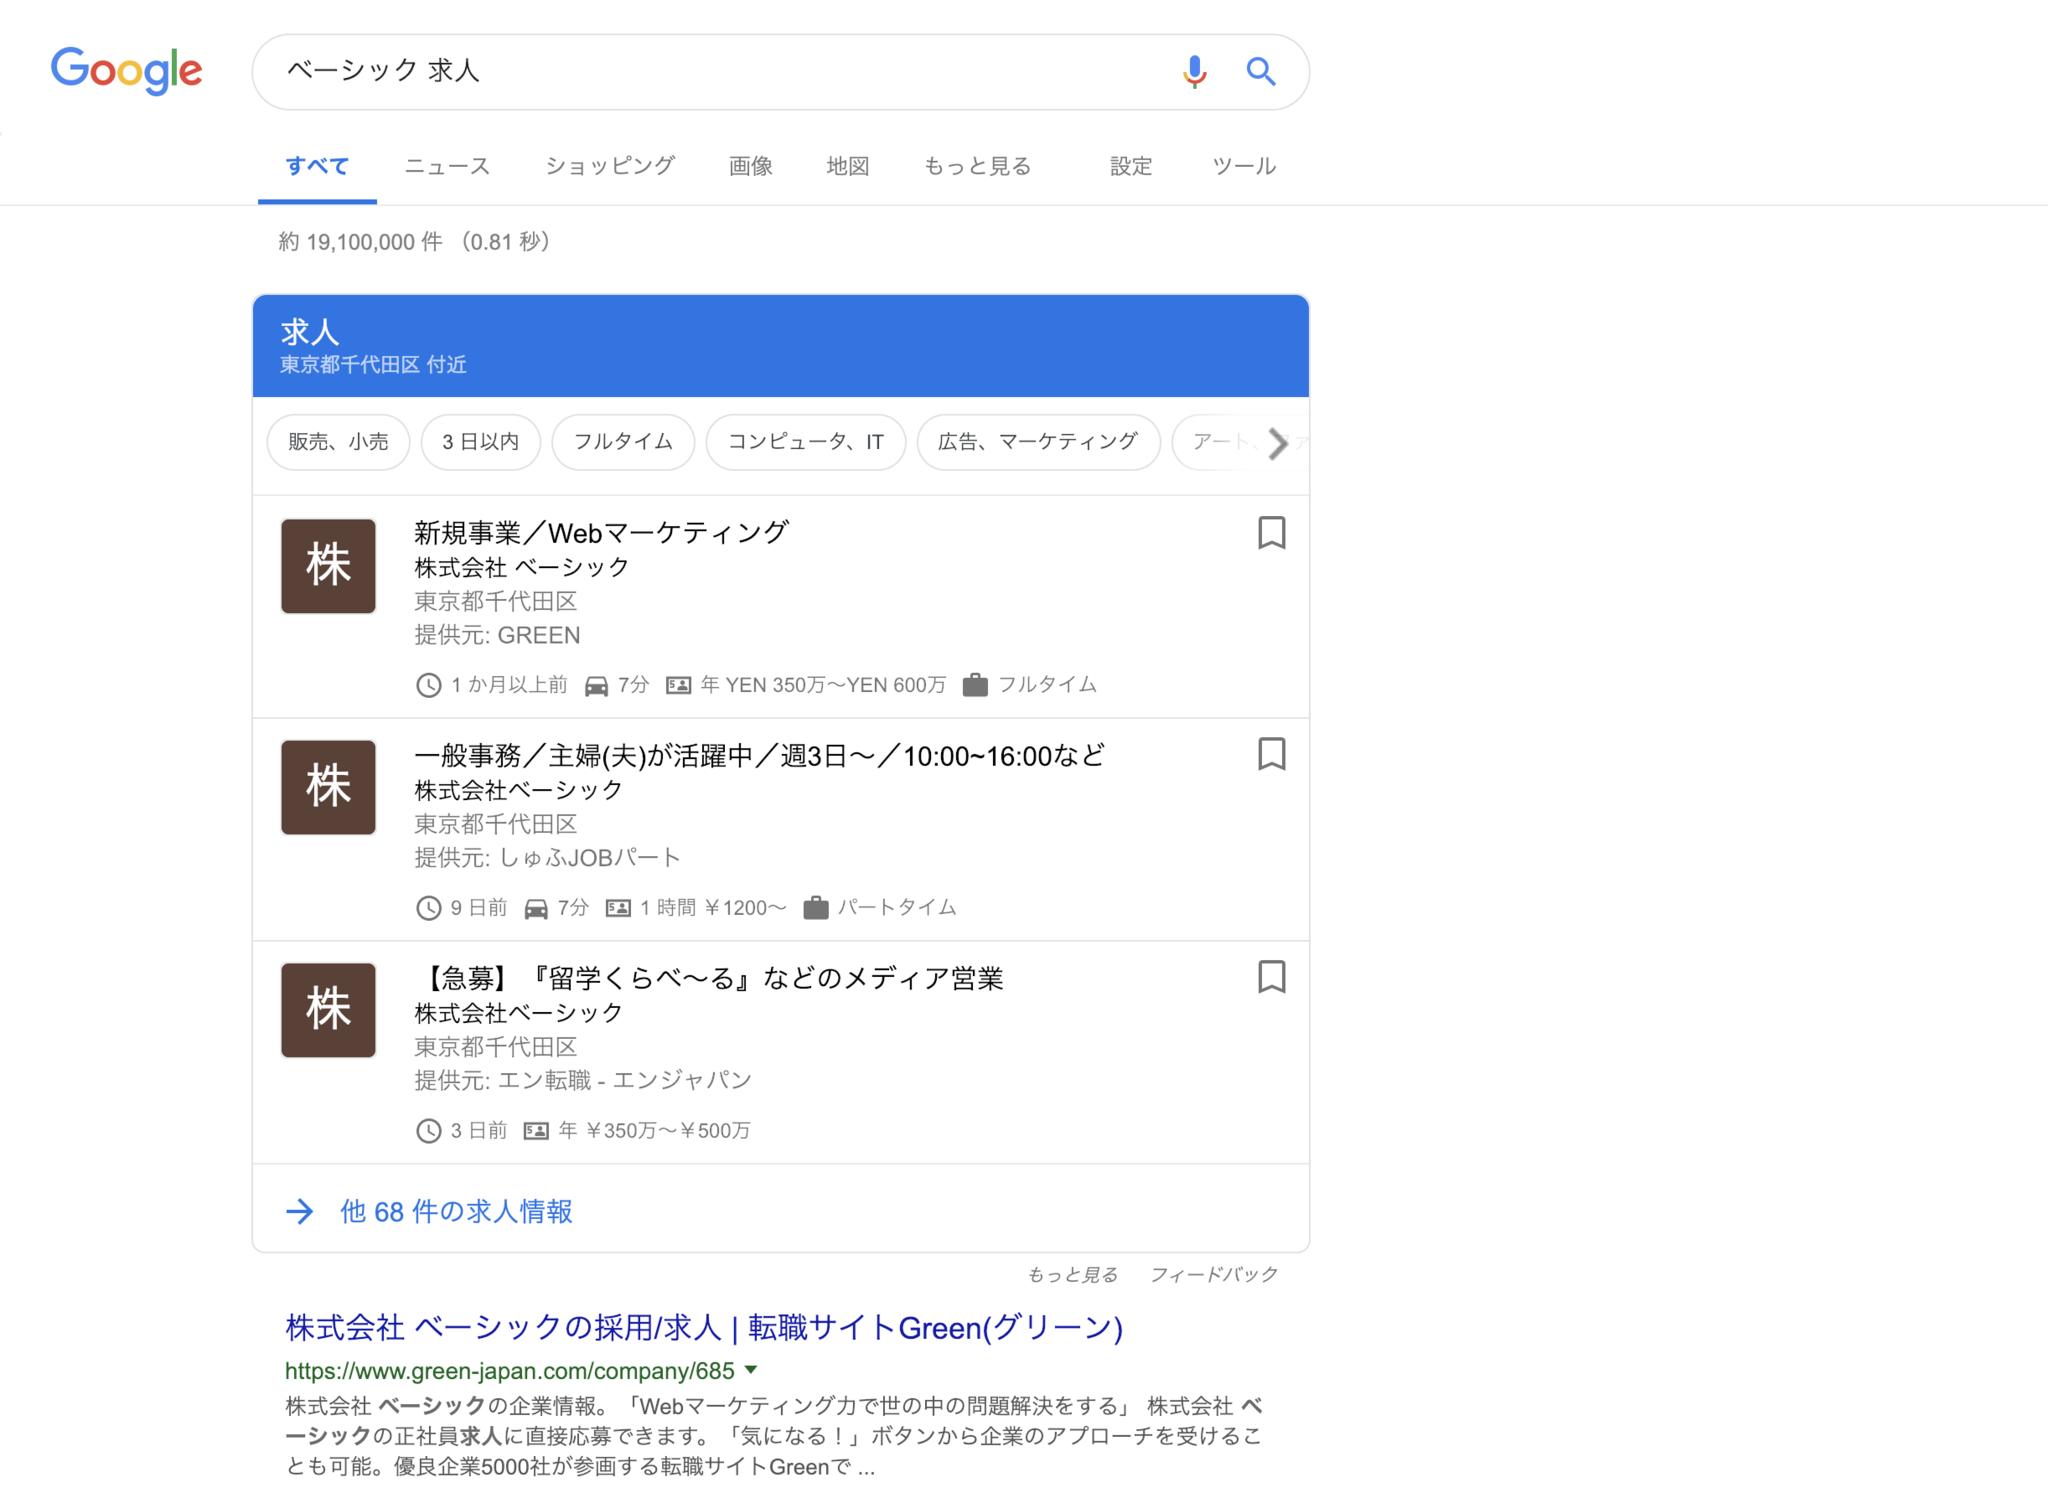 google-03-20190124.png